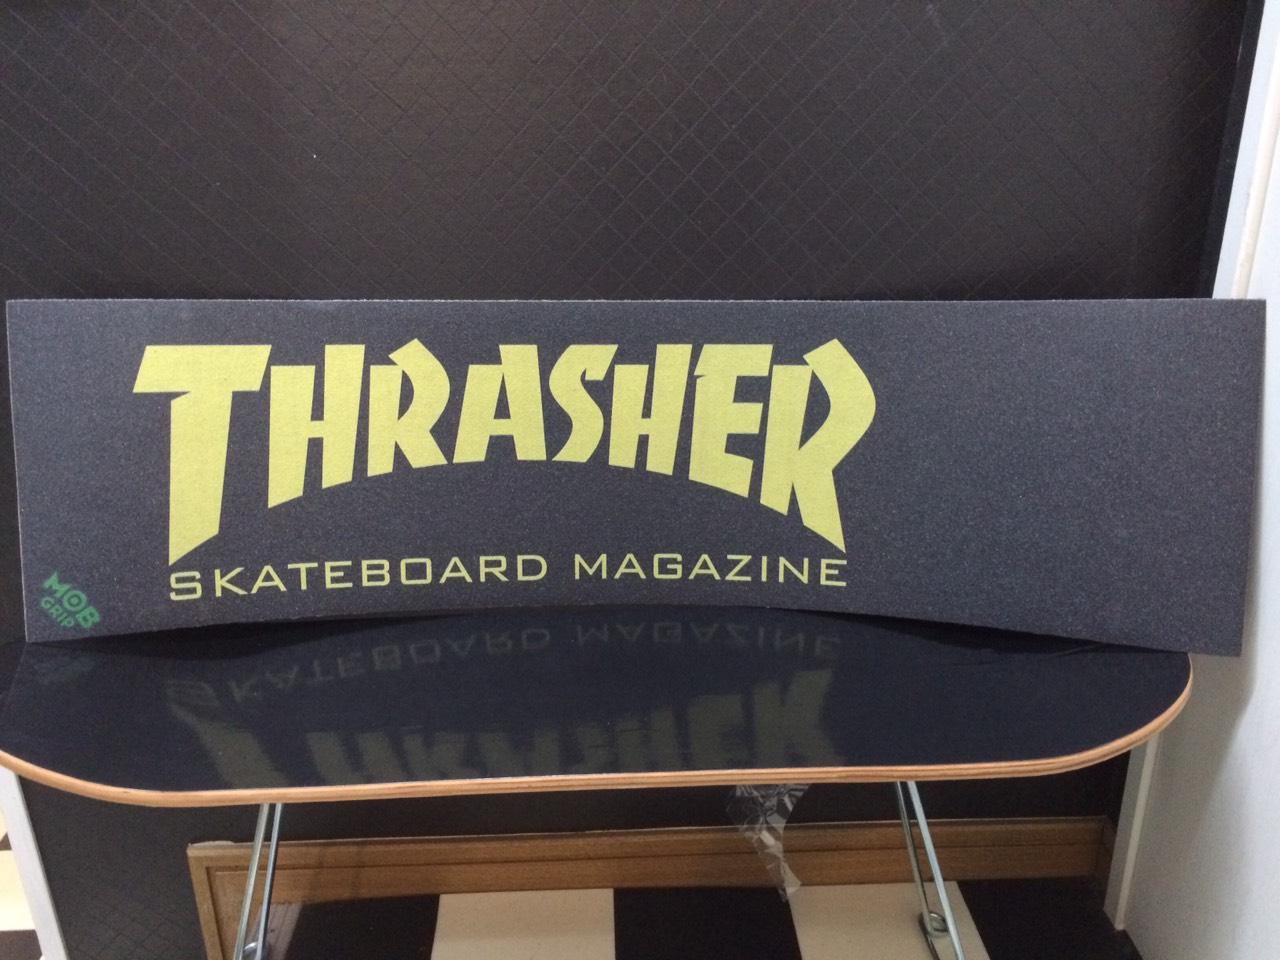 thrasher_decksheet01